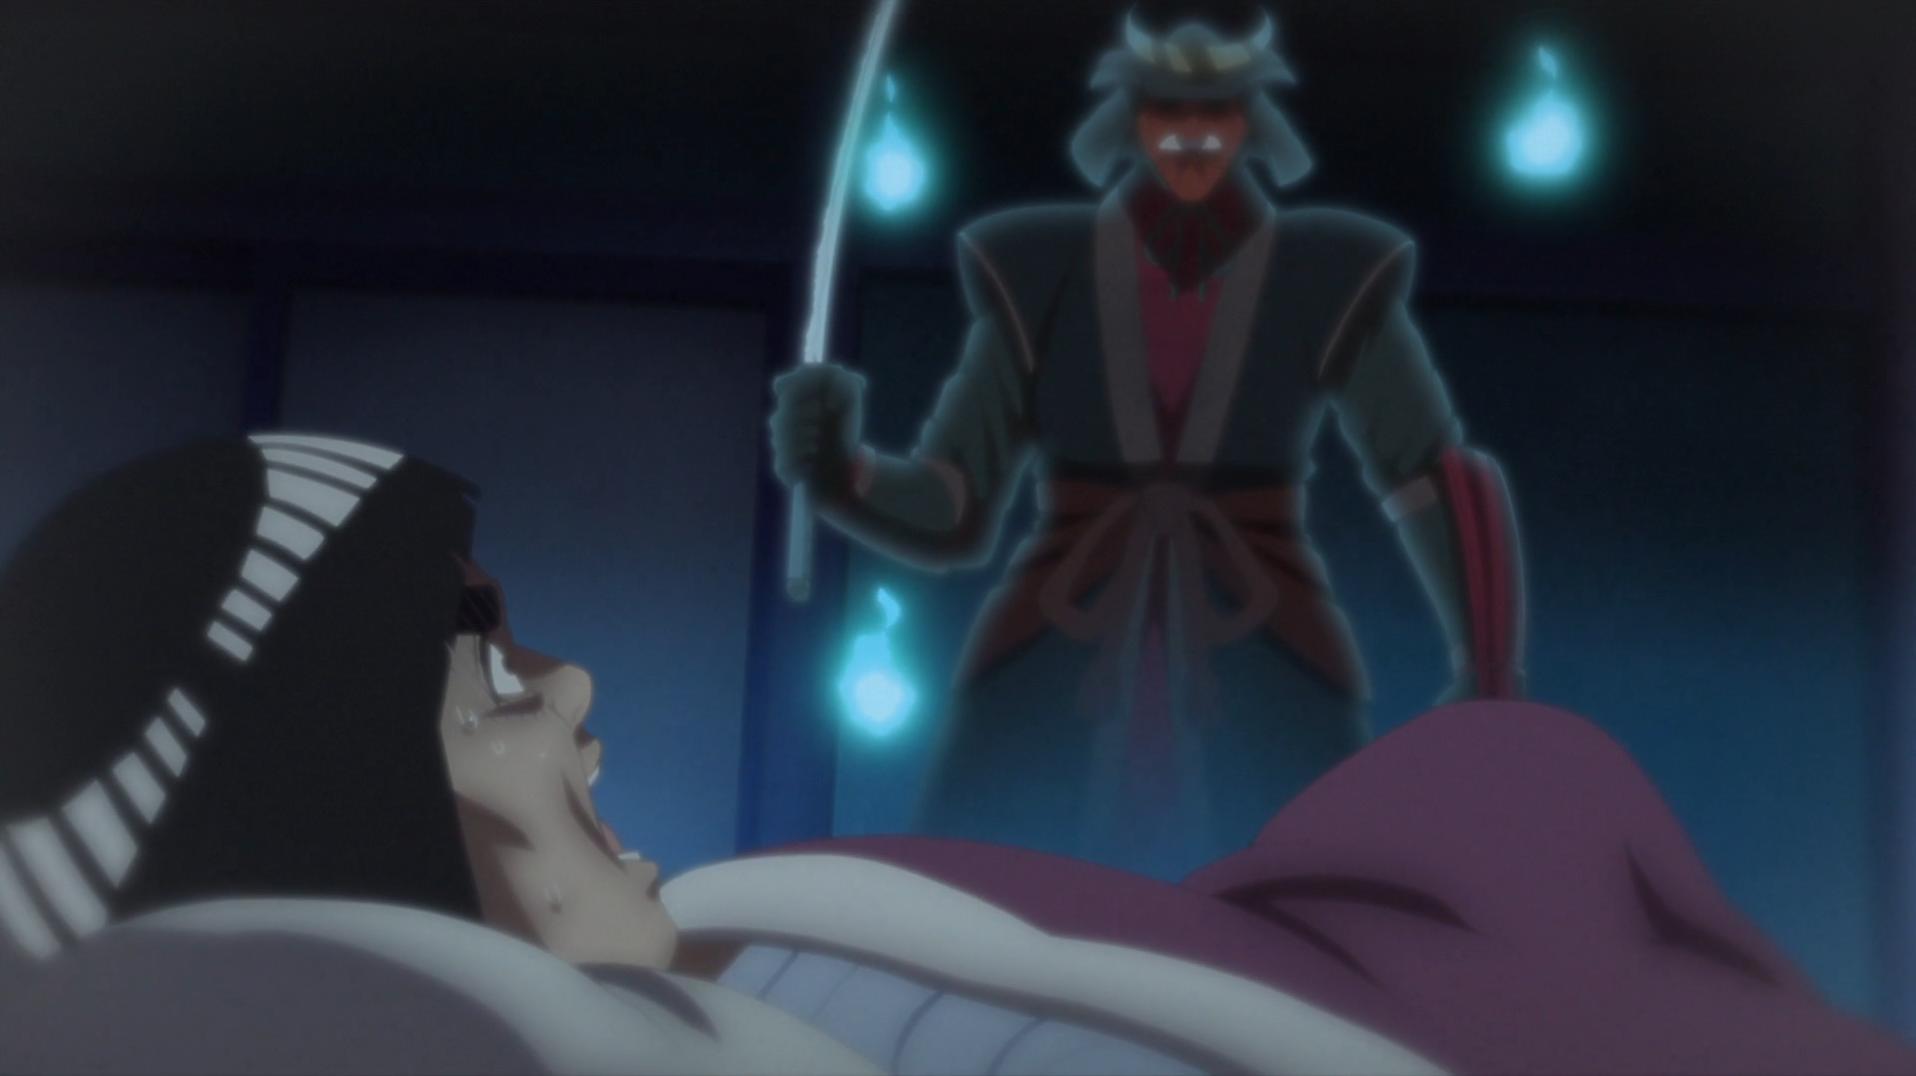 Boruto: Naruto Next Generations Episodio 108